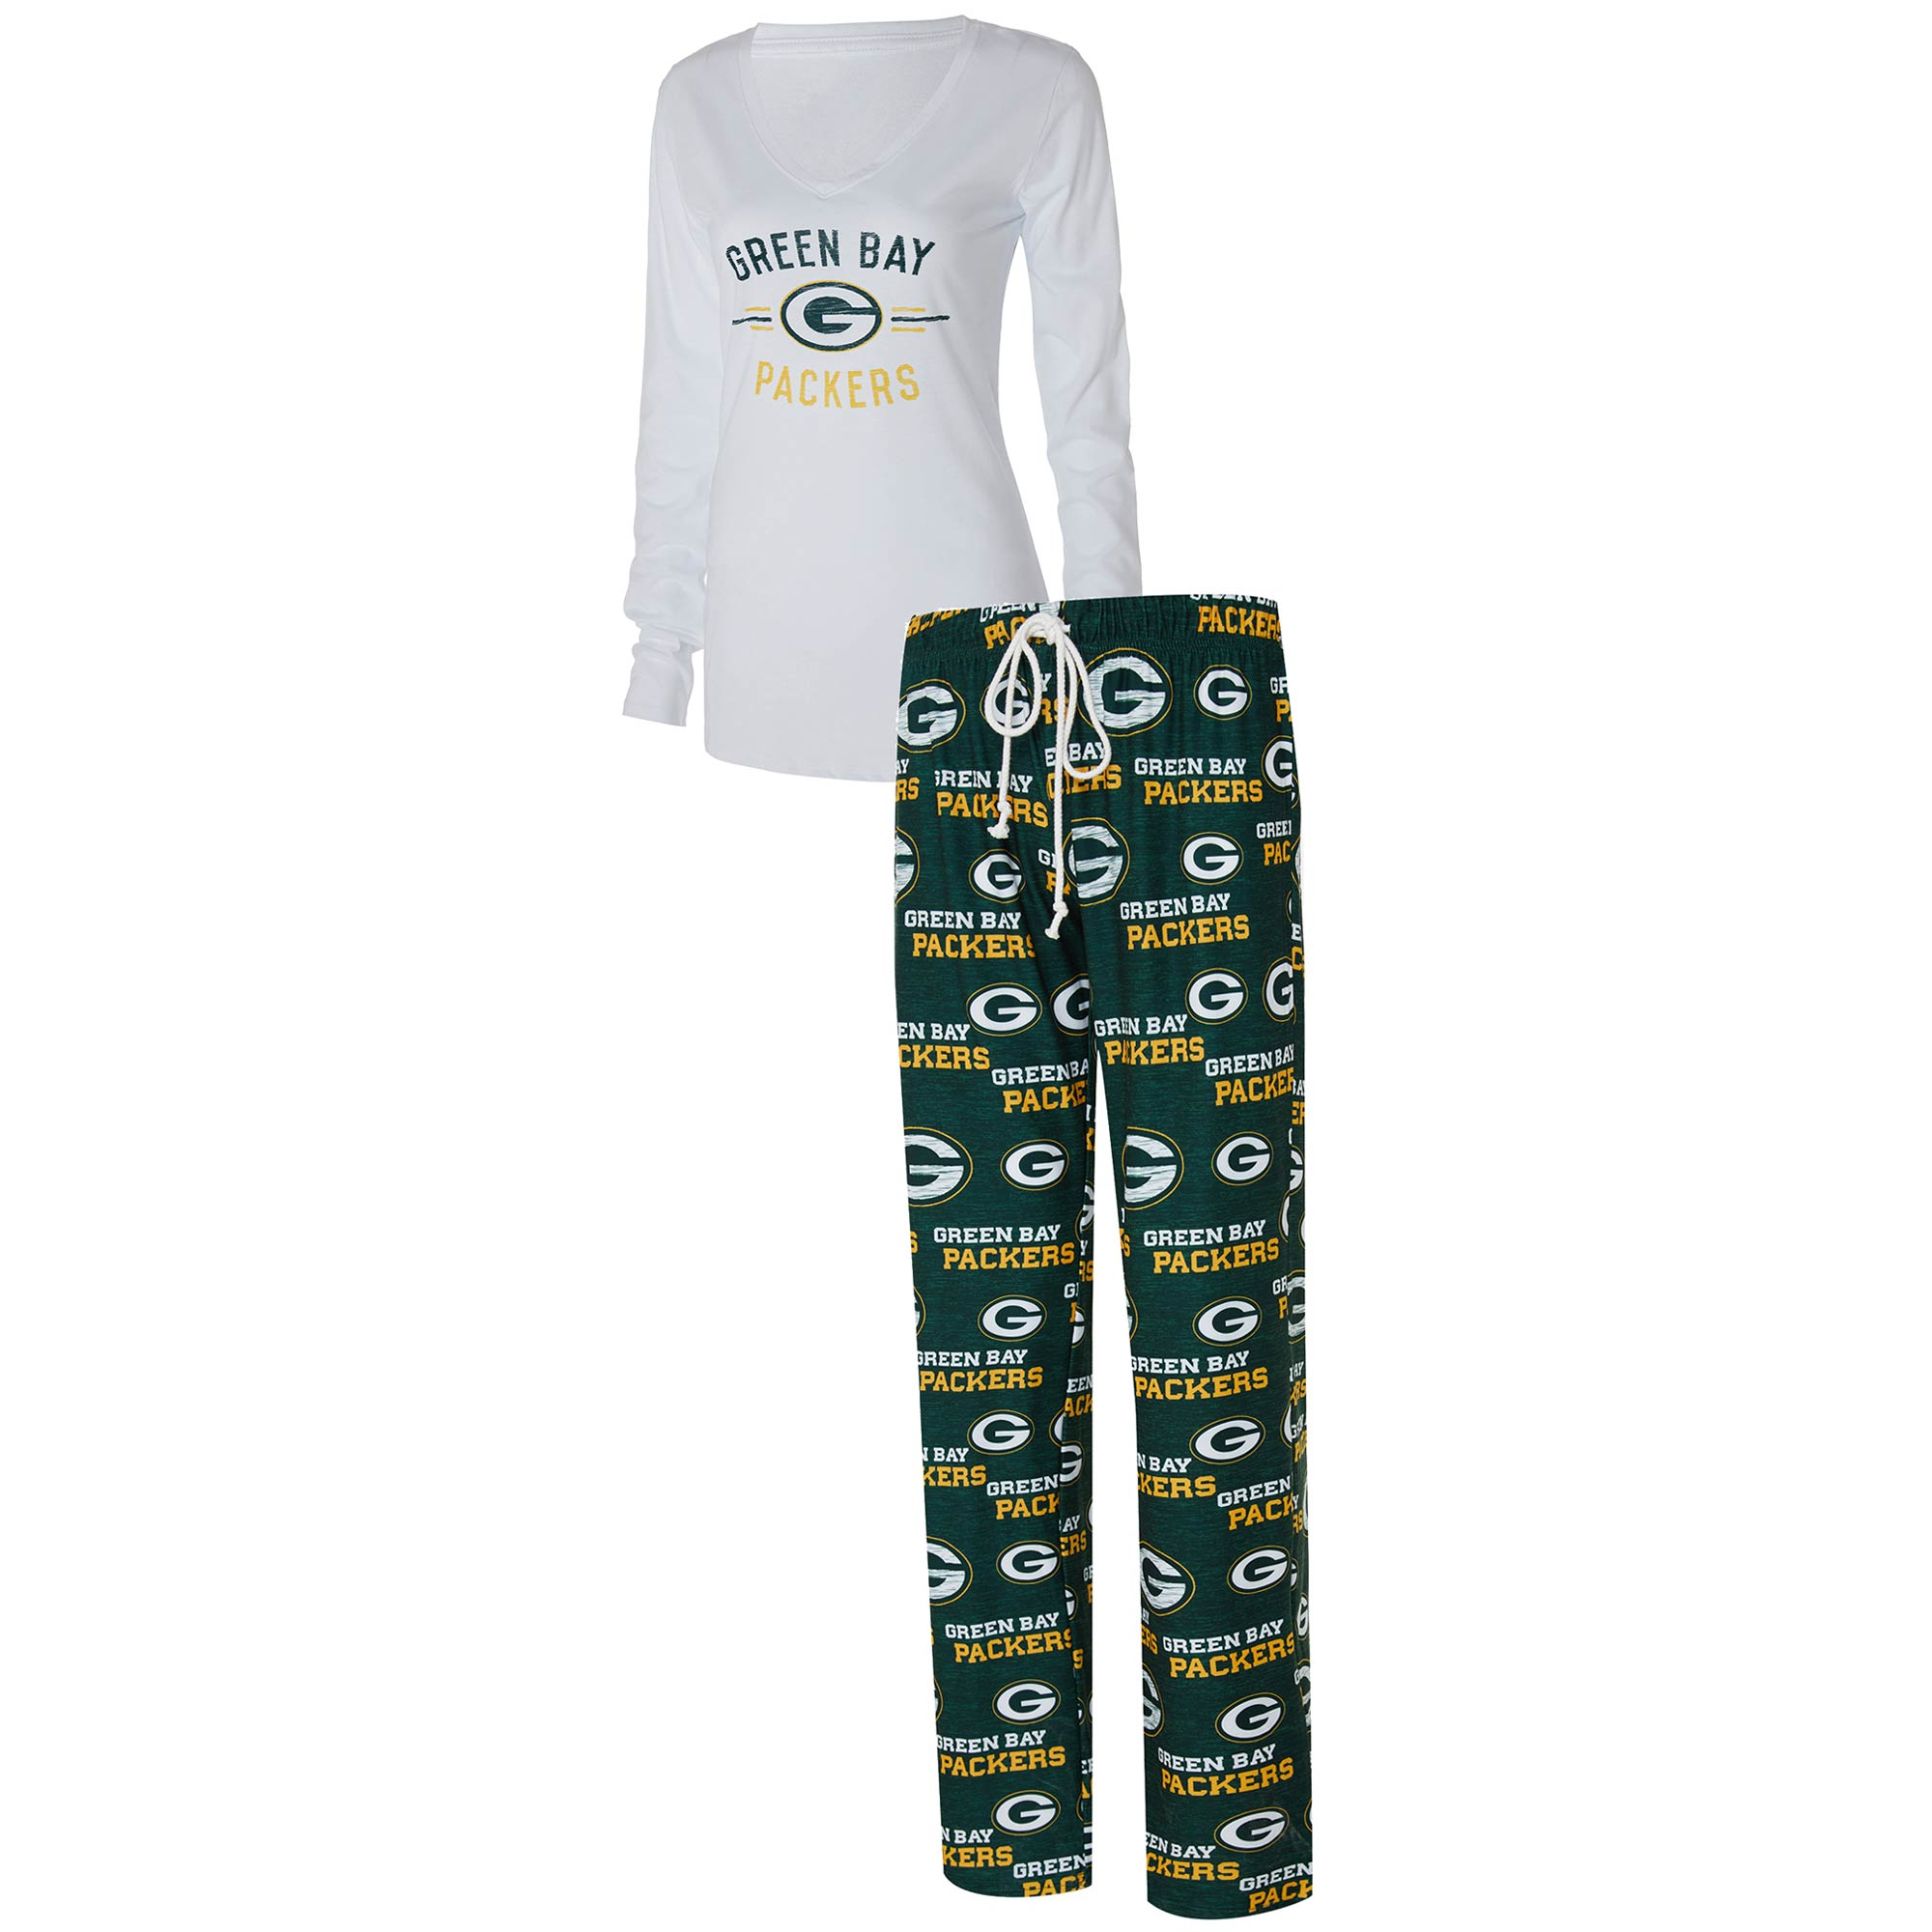 Green Bay Packers Concepts Sport Women's Zest Long Sleeve V-Neck T-Shirt & Pants Sleep Set - White/Green